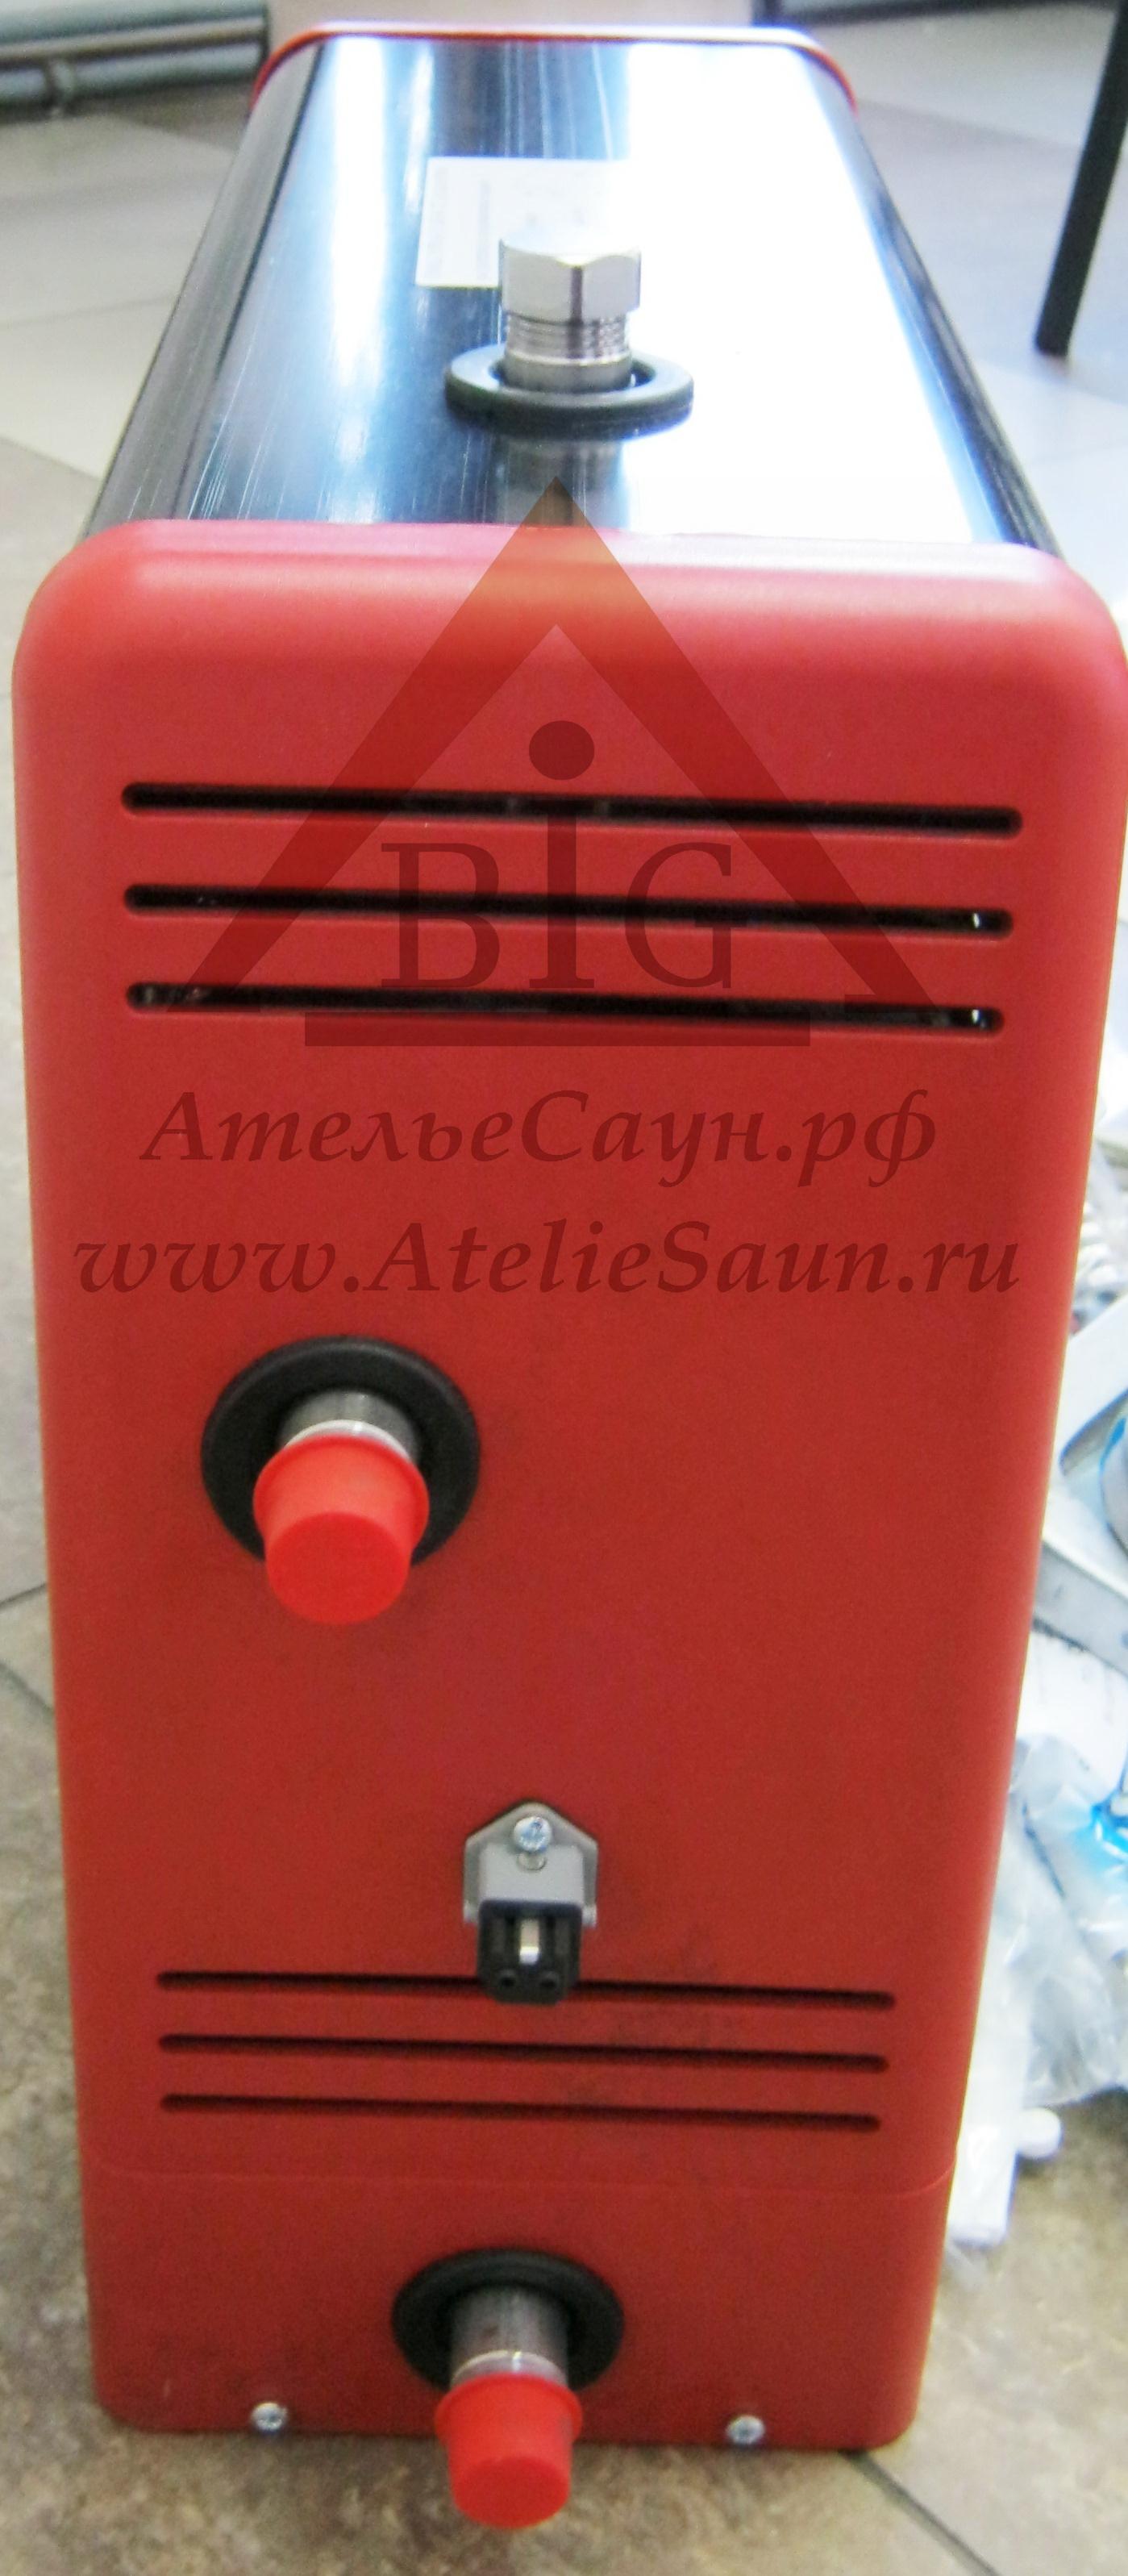 Парогенератор Helo HNS 47 T1 (4,7 кВт, без пульта T1, чёрный)